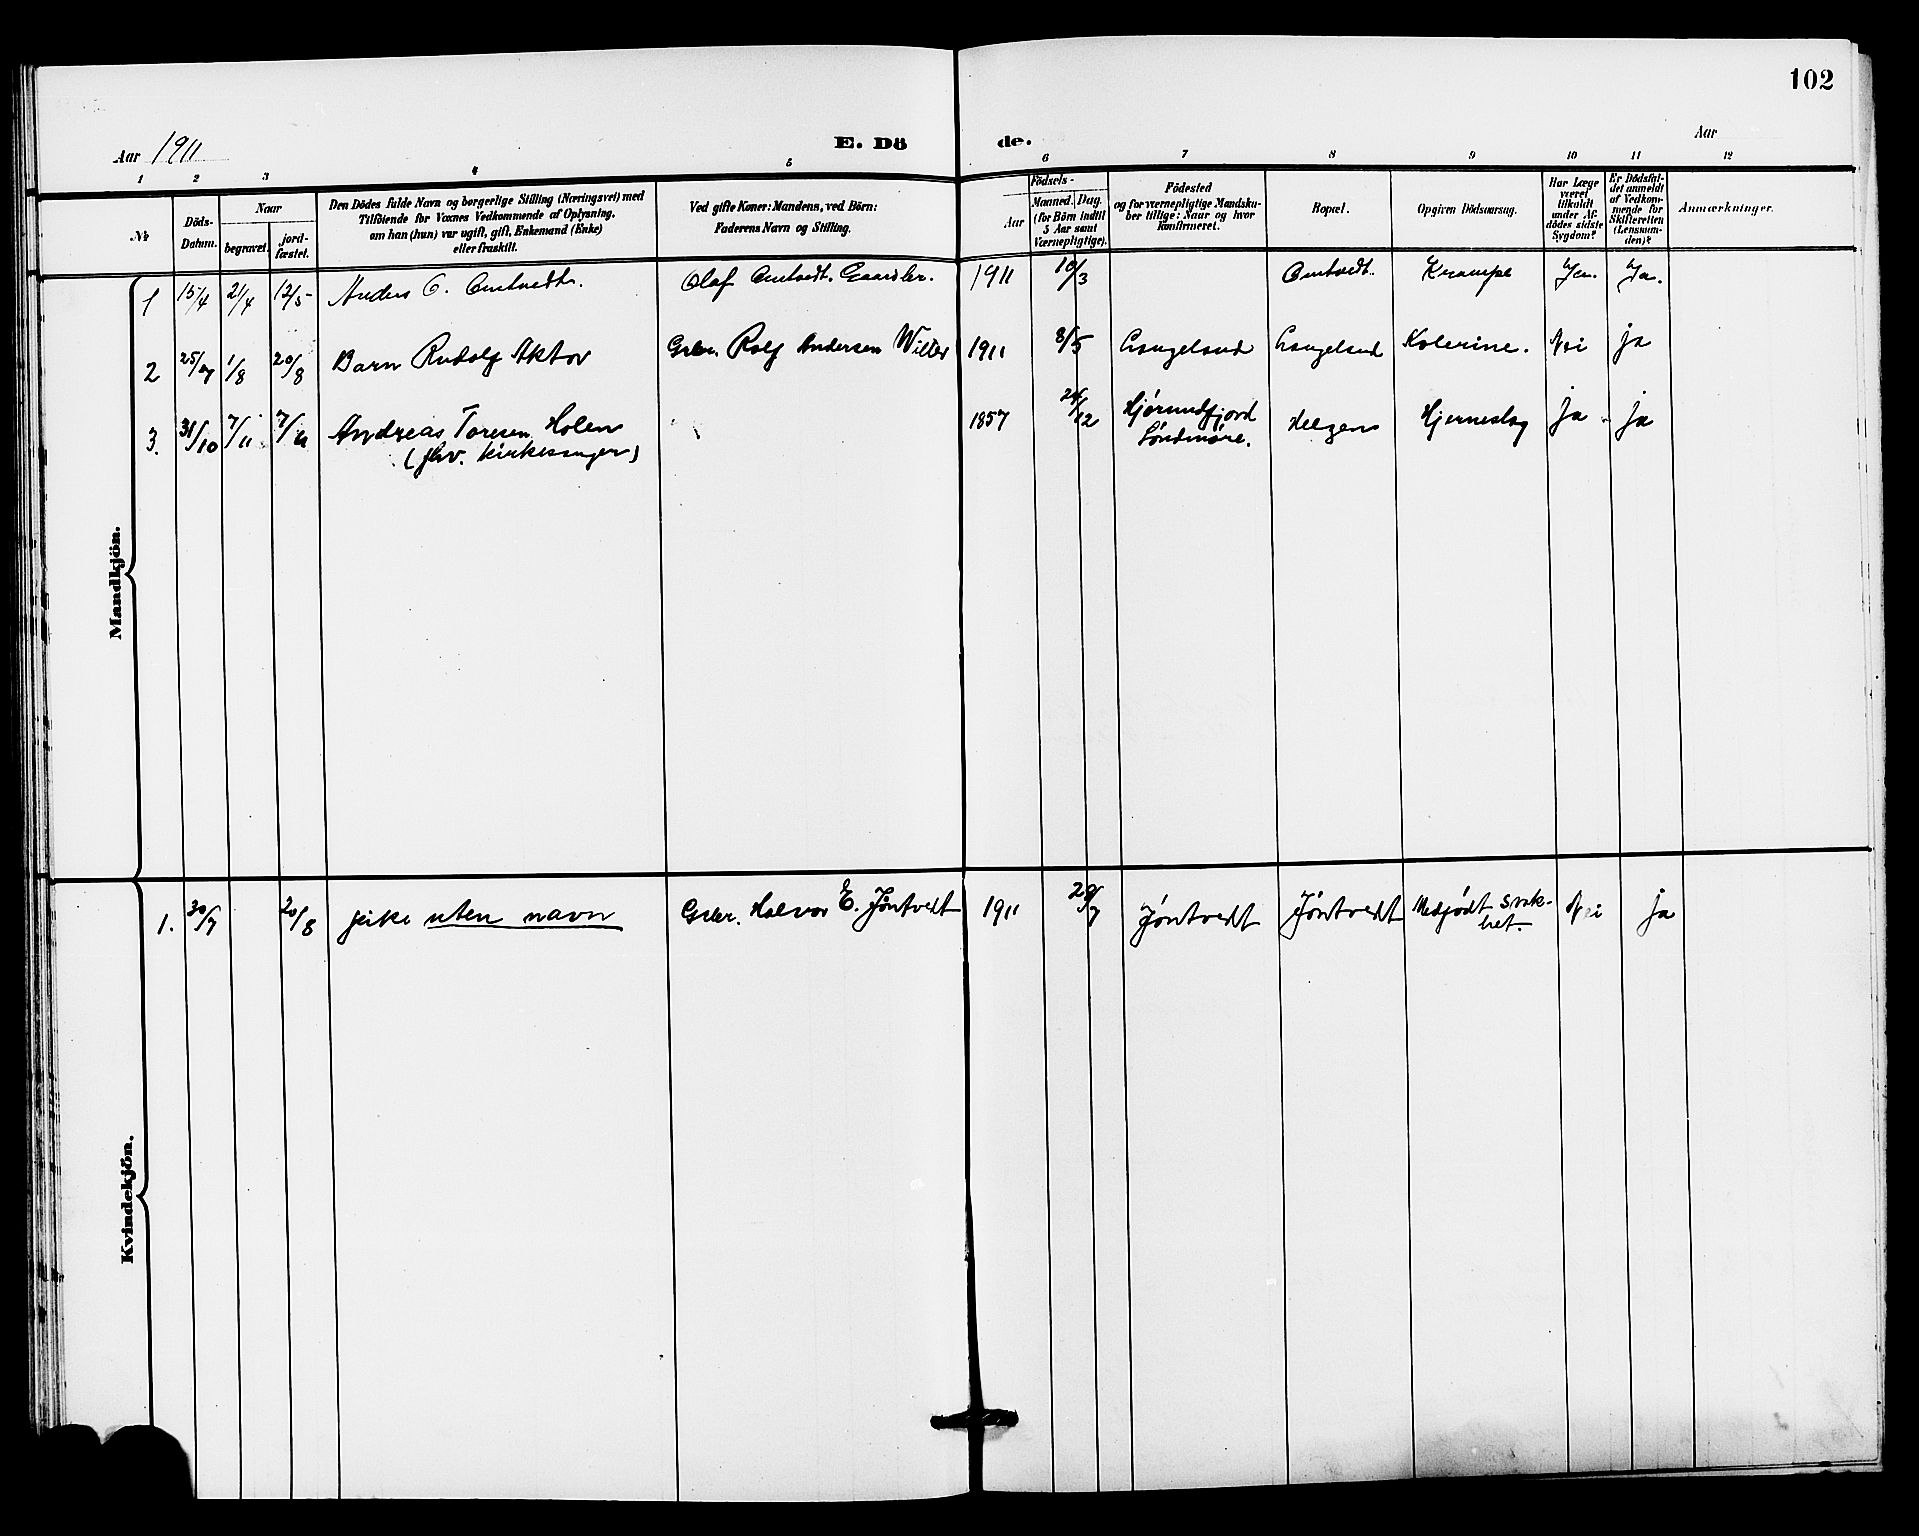 SAKO, Holla kirkebøker, G/Gb/L0002: Klokkerbok nr. II 2, 1897-1913, s. 102